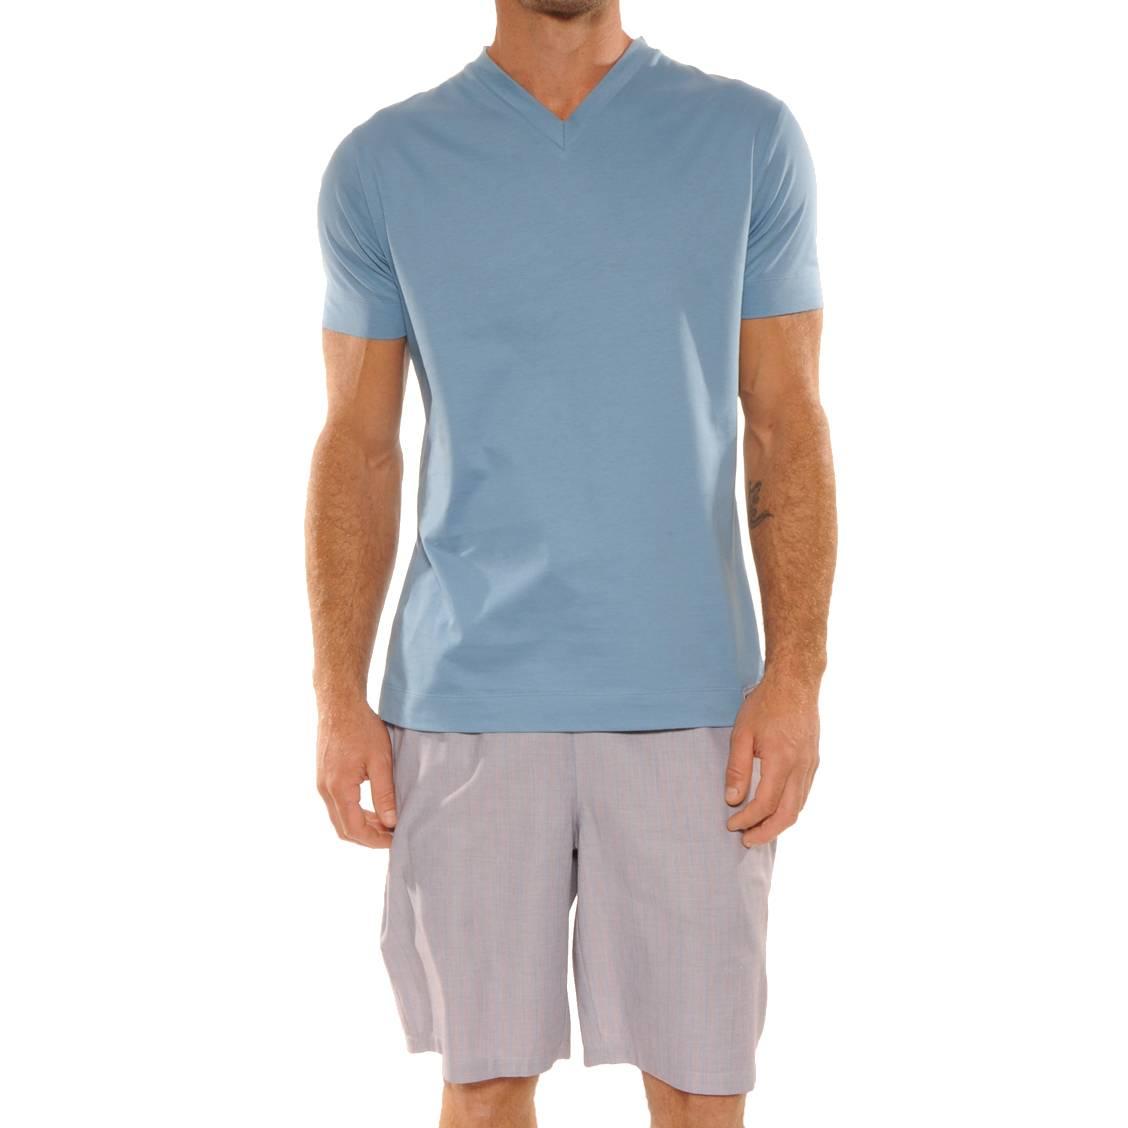 Shirt Bleu Turquoise Pyjama Pilus Col 100CotonTee V Court Hans I6fv7mYgby